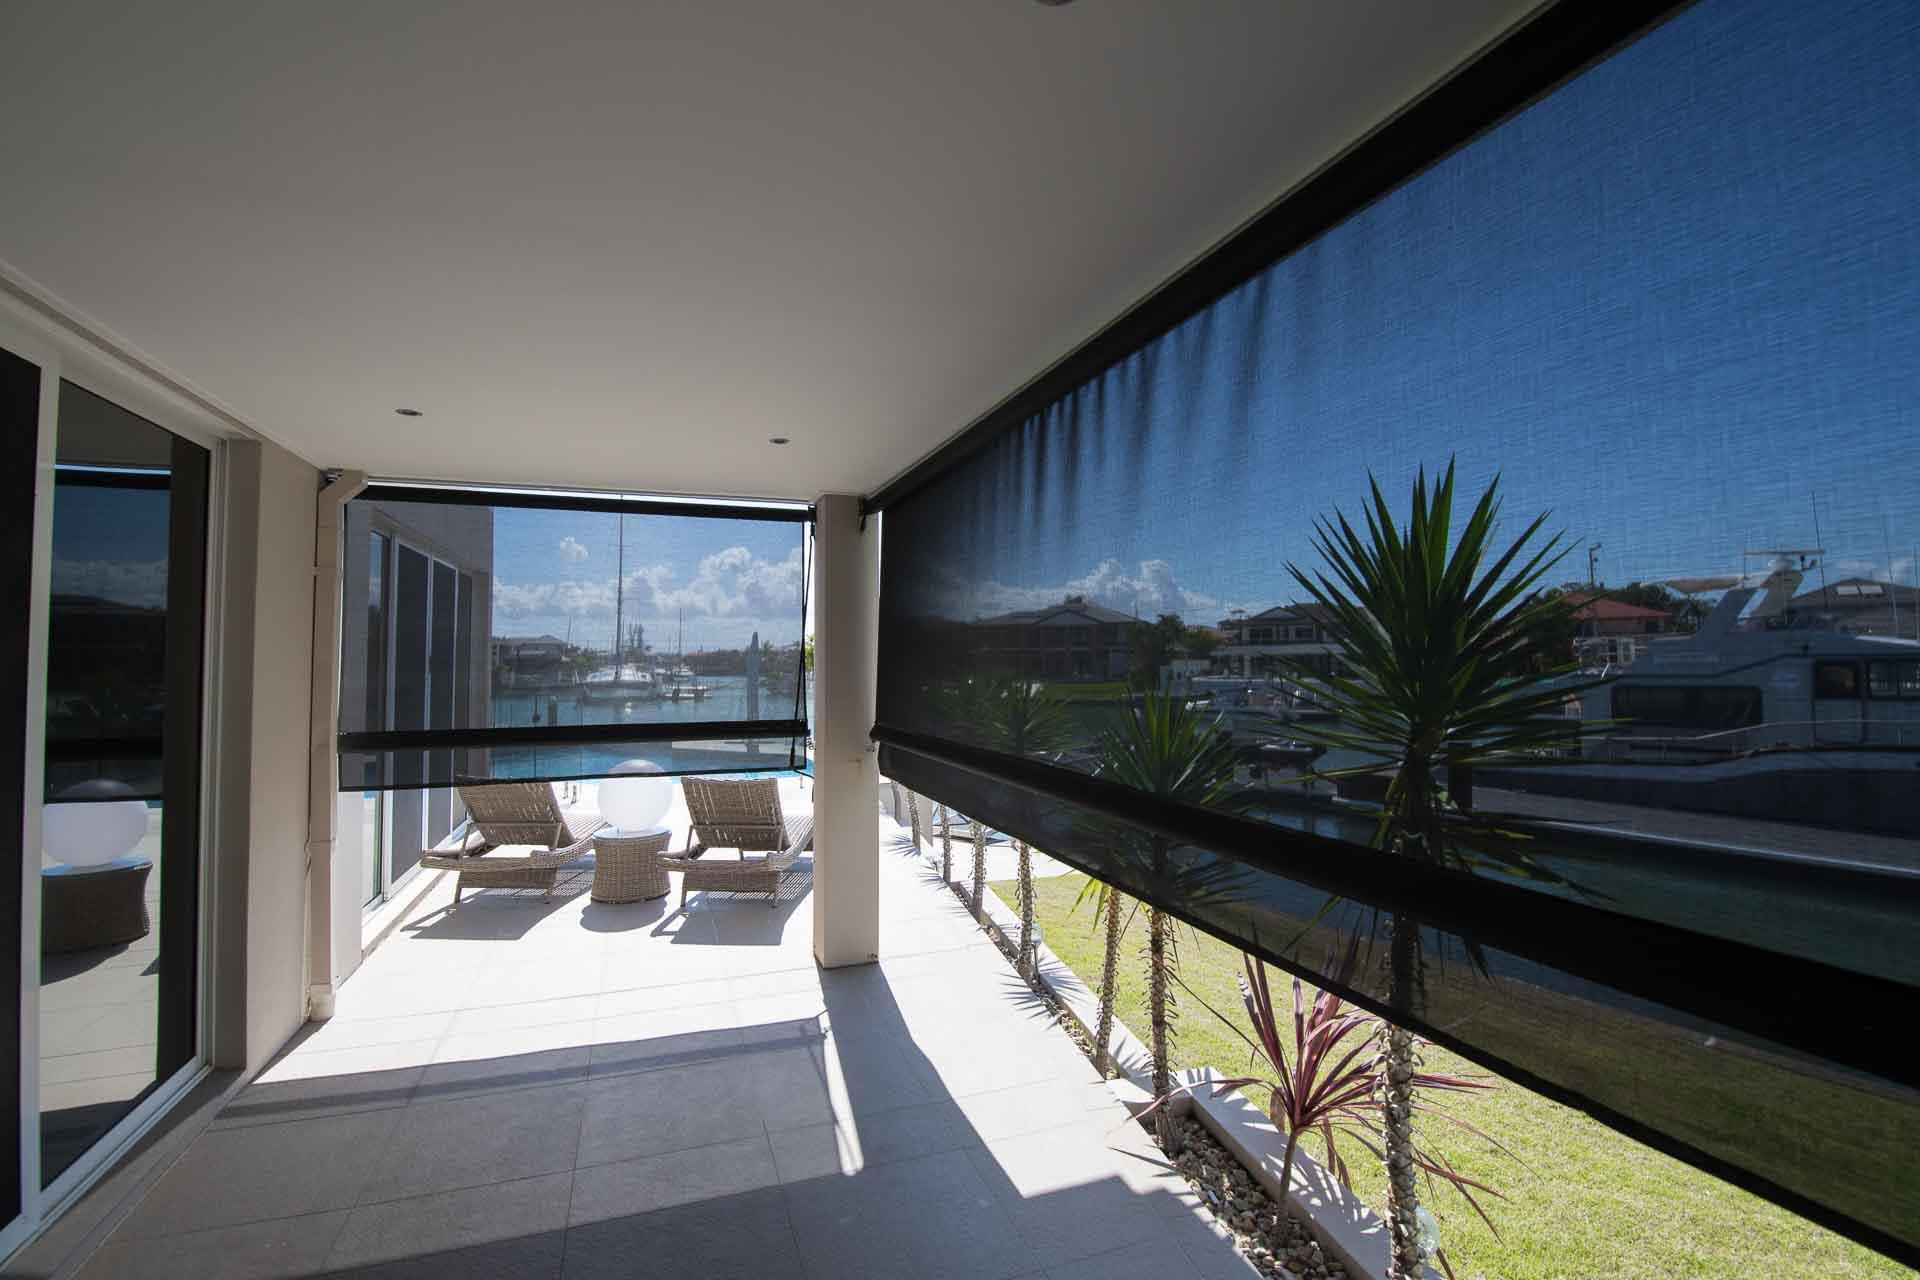 Outdoor blinds offer shade for your verandah, patio or pergola.